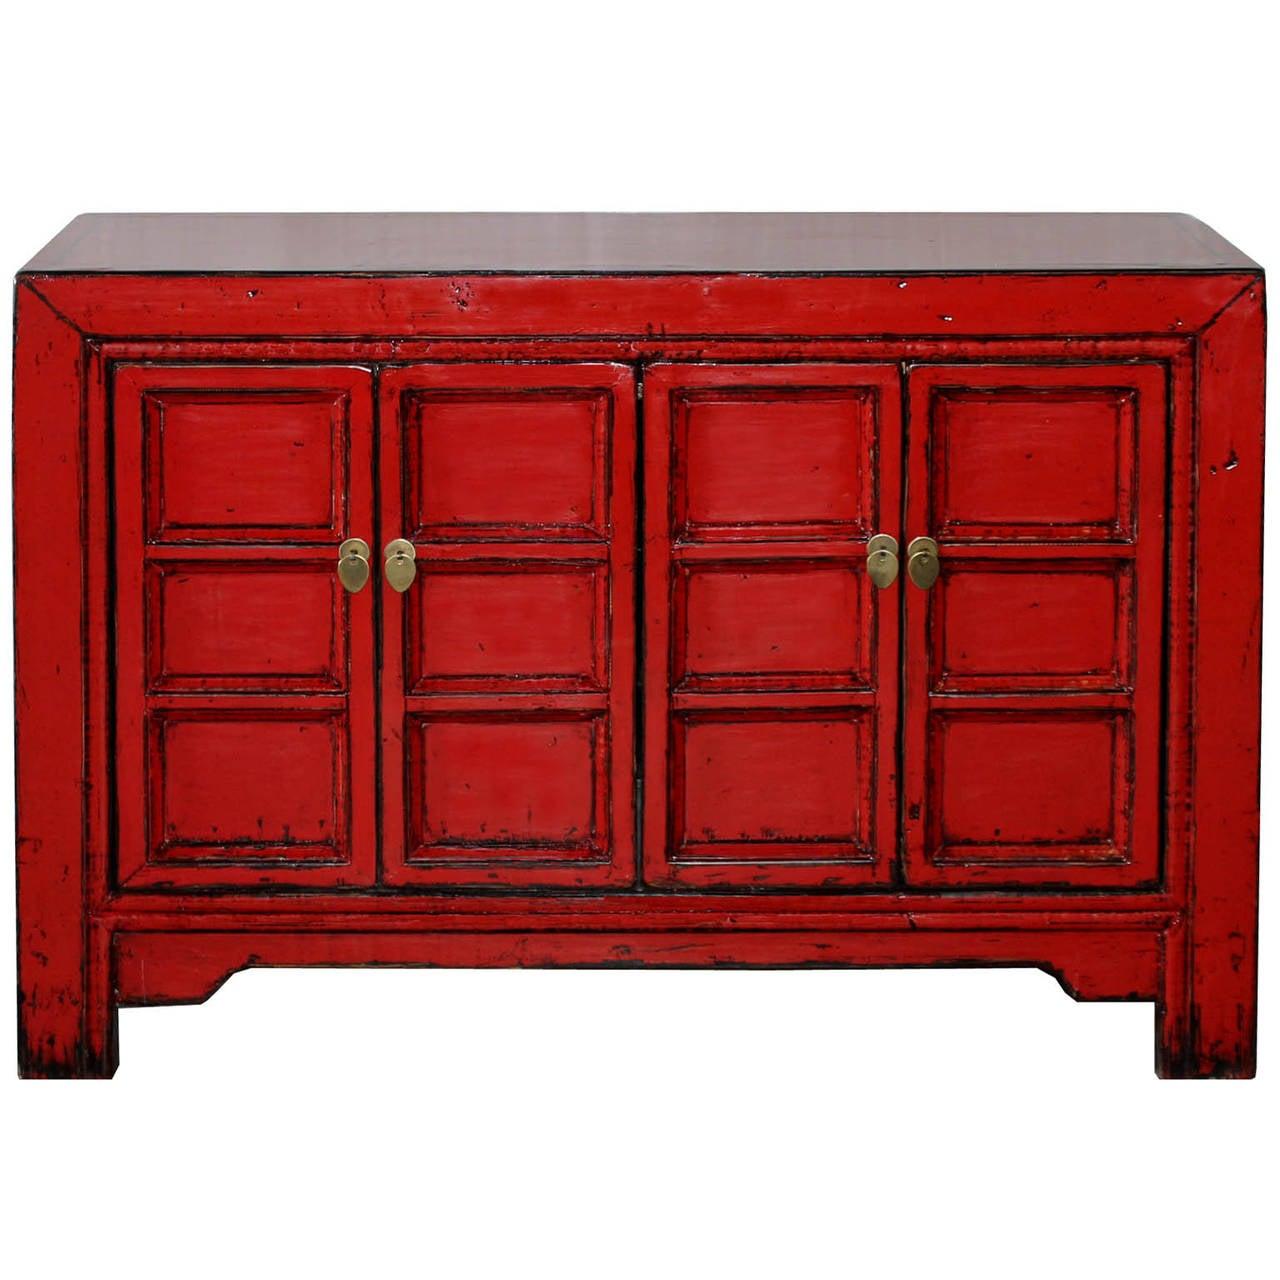 Red Paneled Door Buffet at 1stdibs